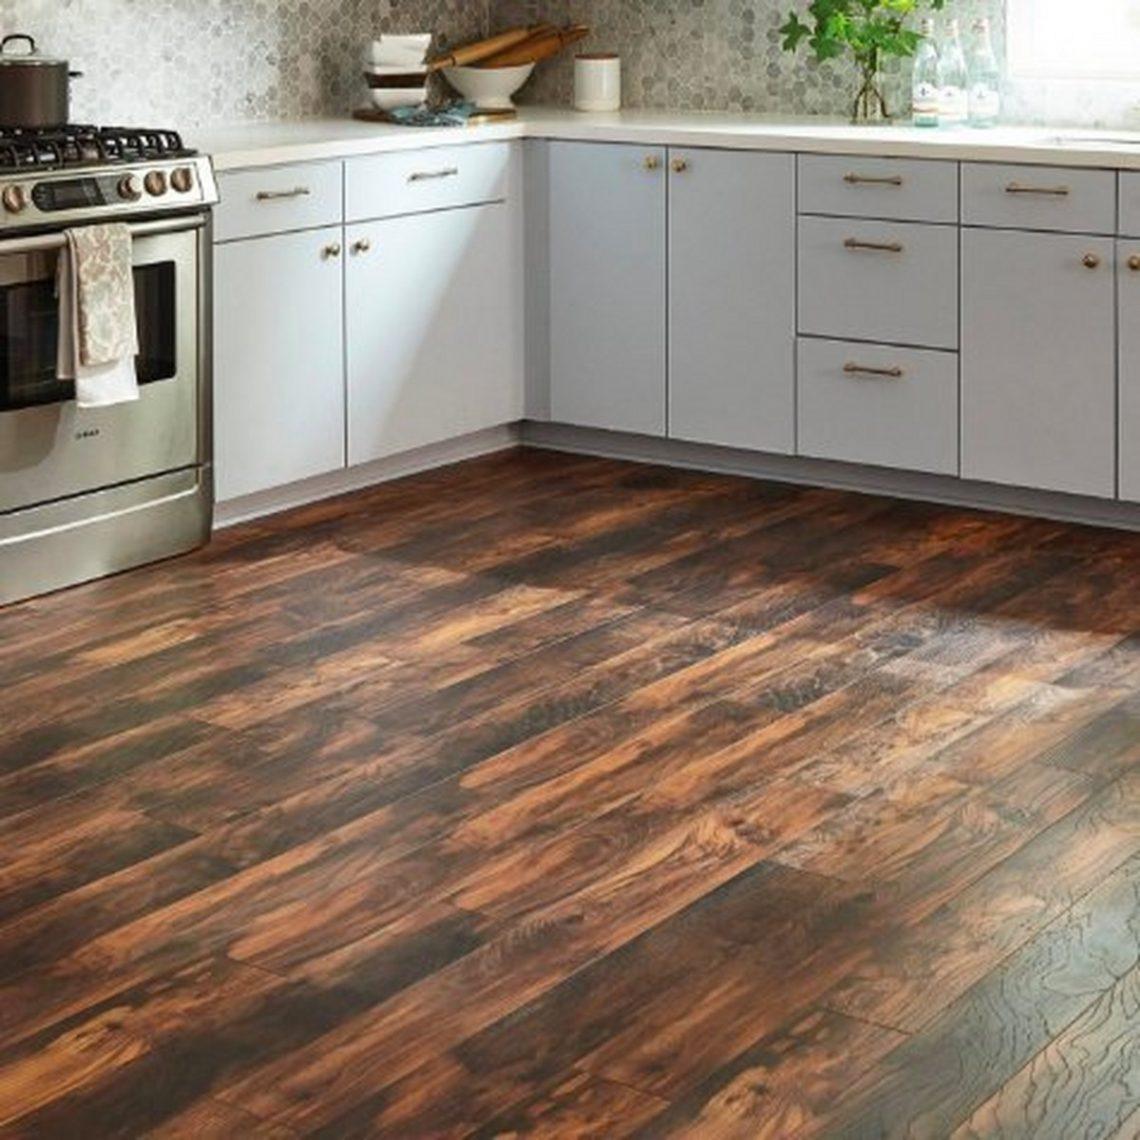 How Much Laminate Flooring Is Durable, Durable Laminate Flooring